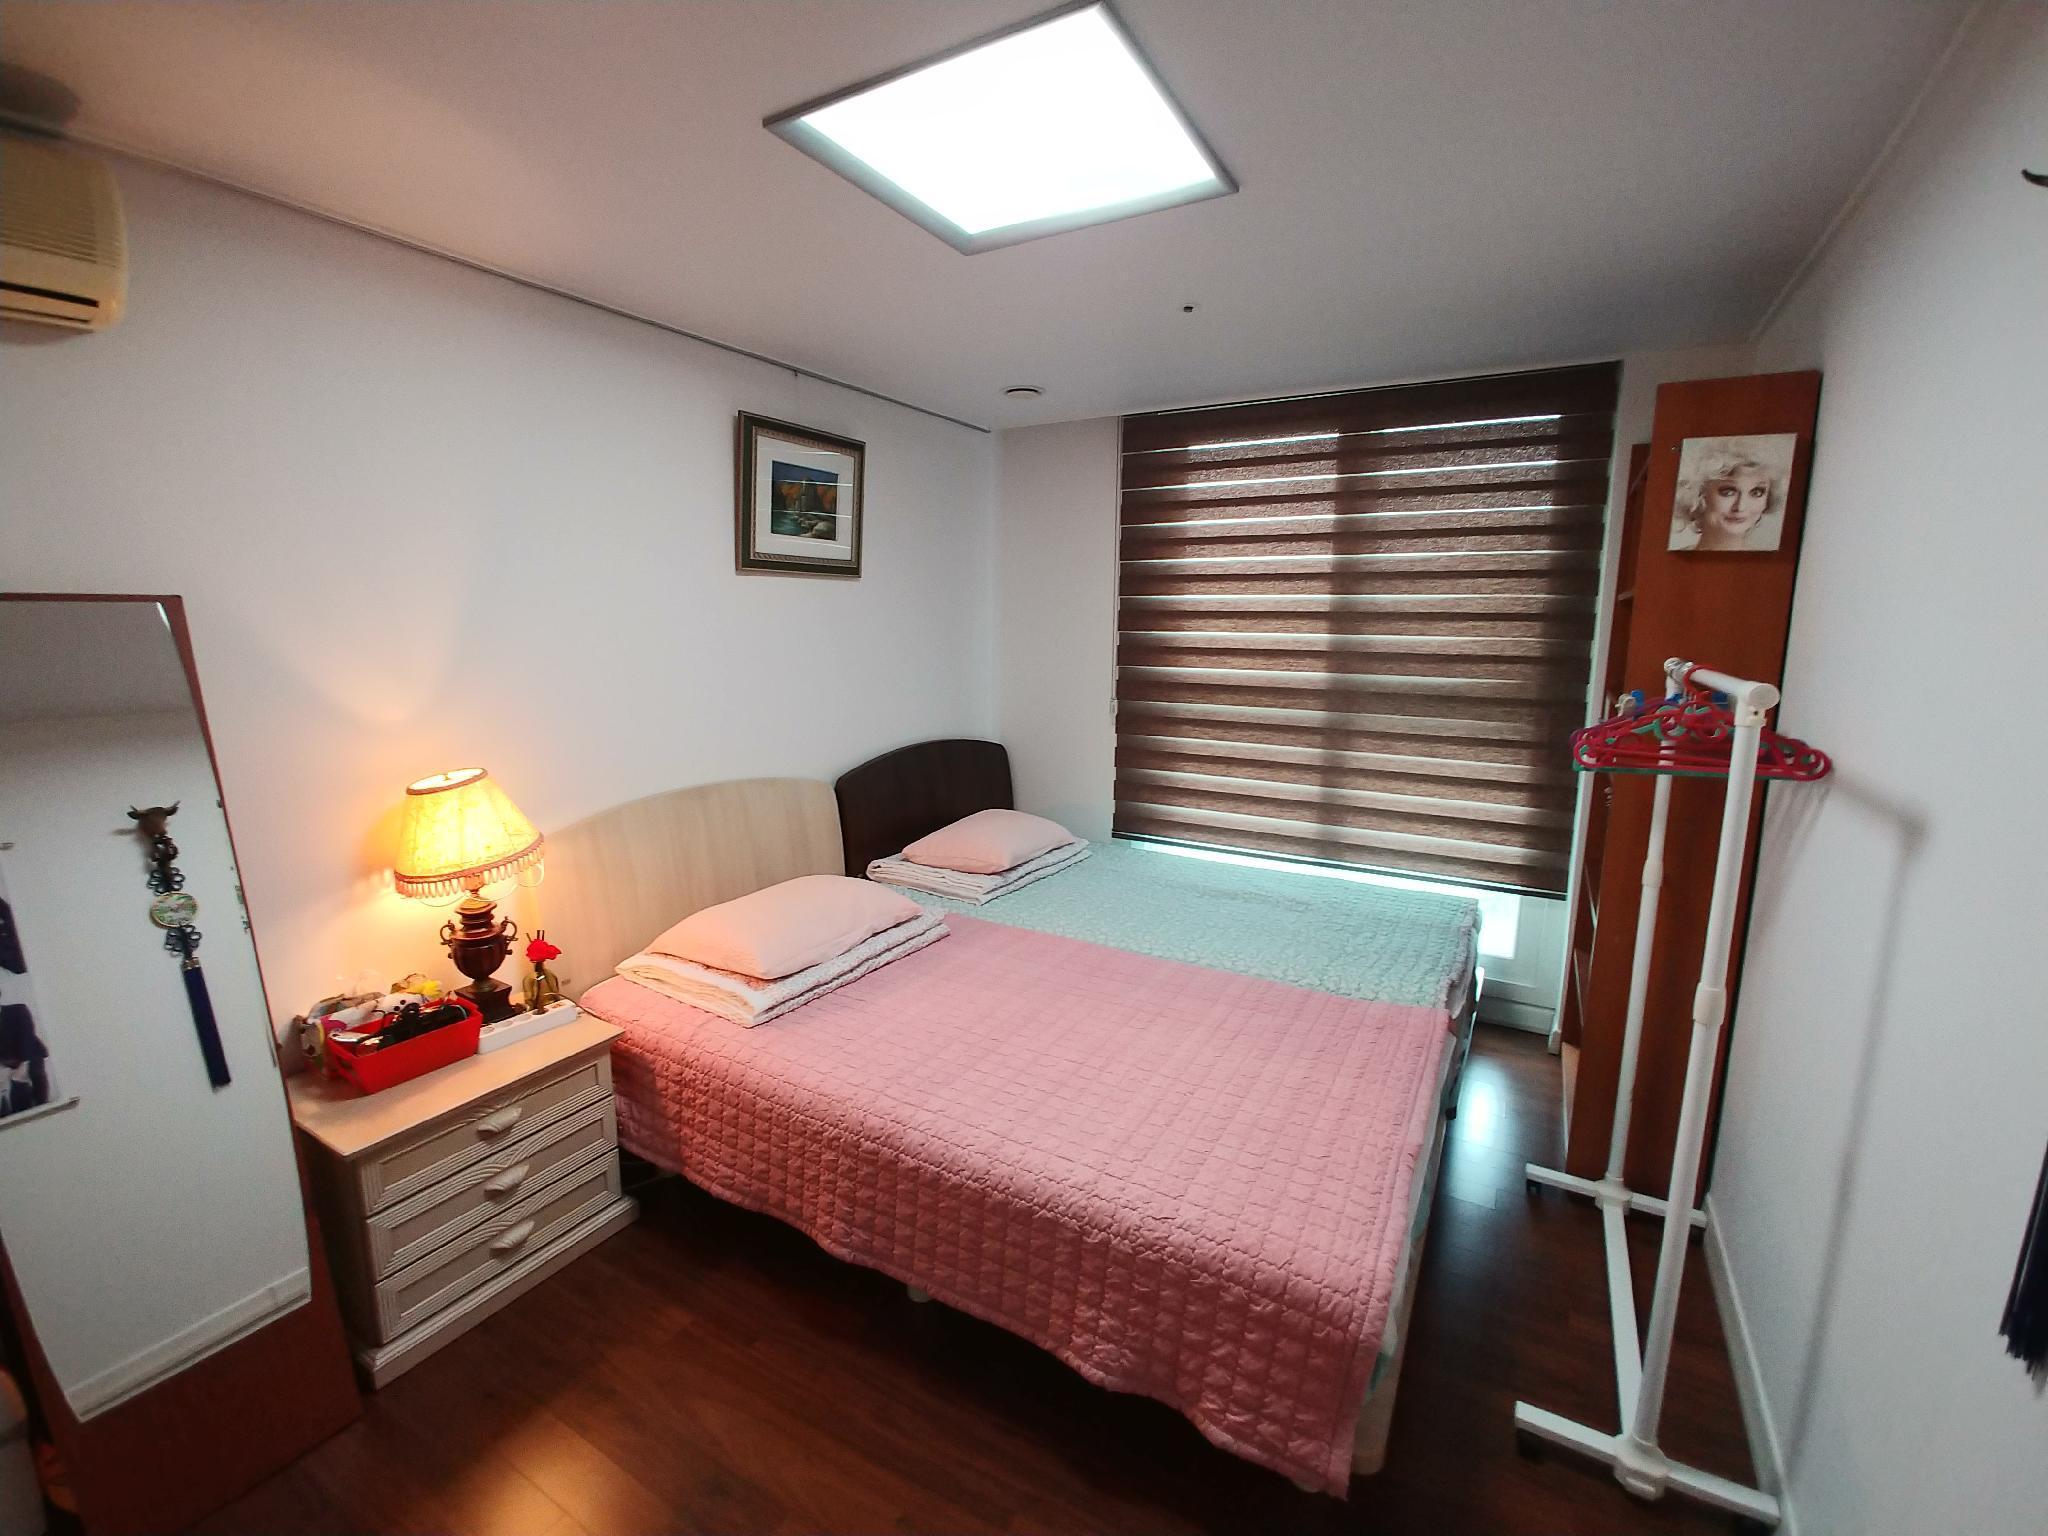 Skycozy Room 2